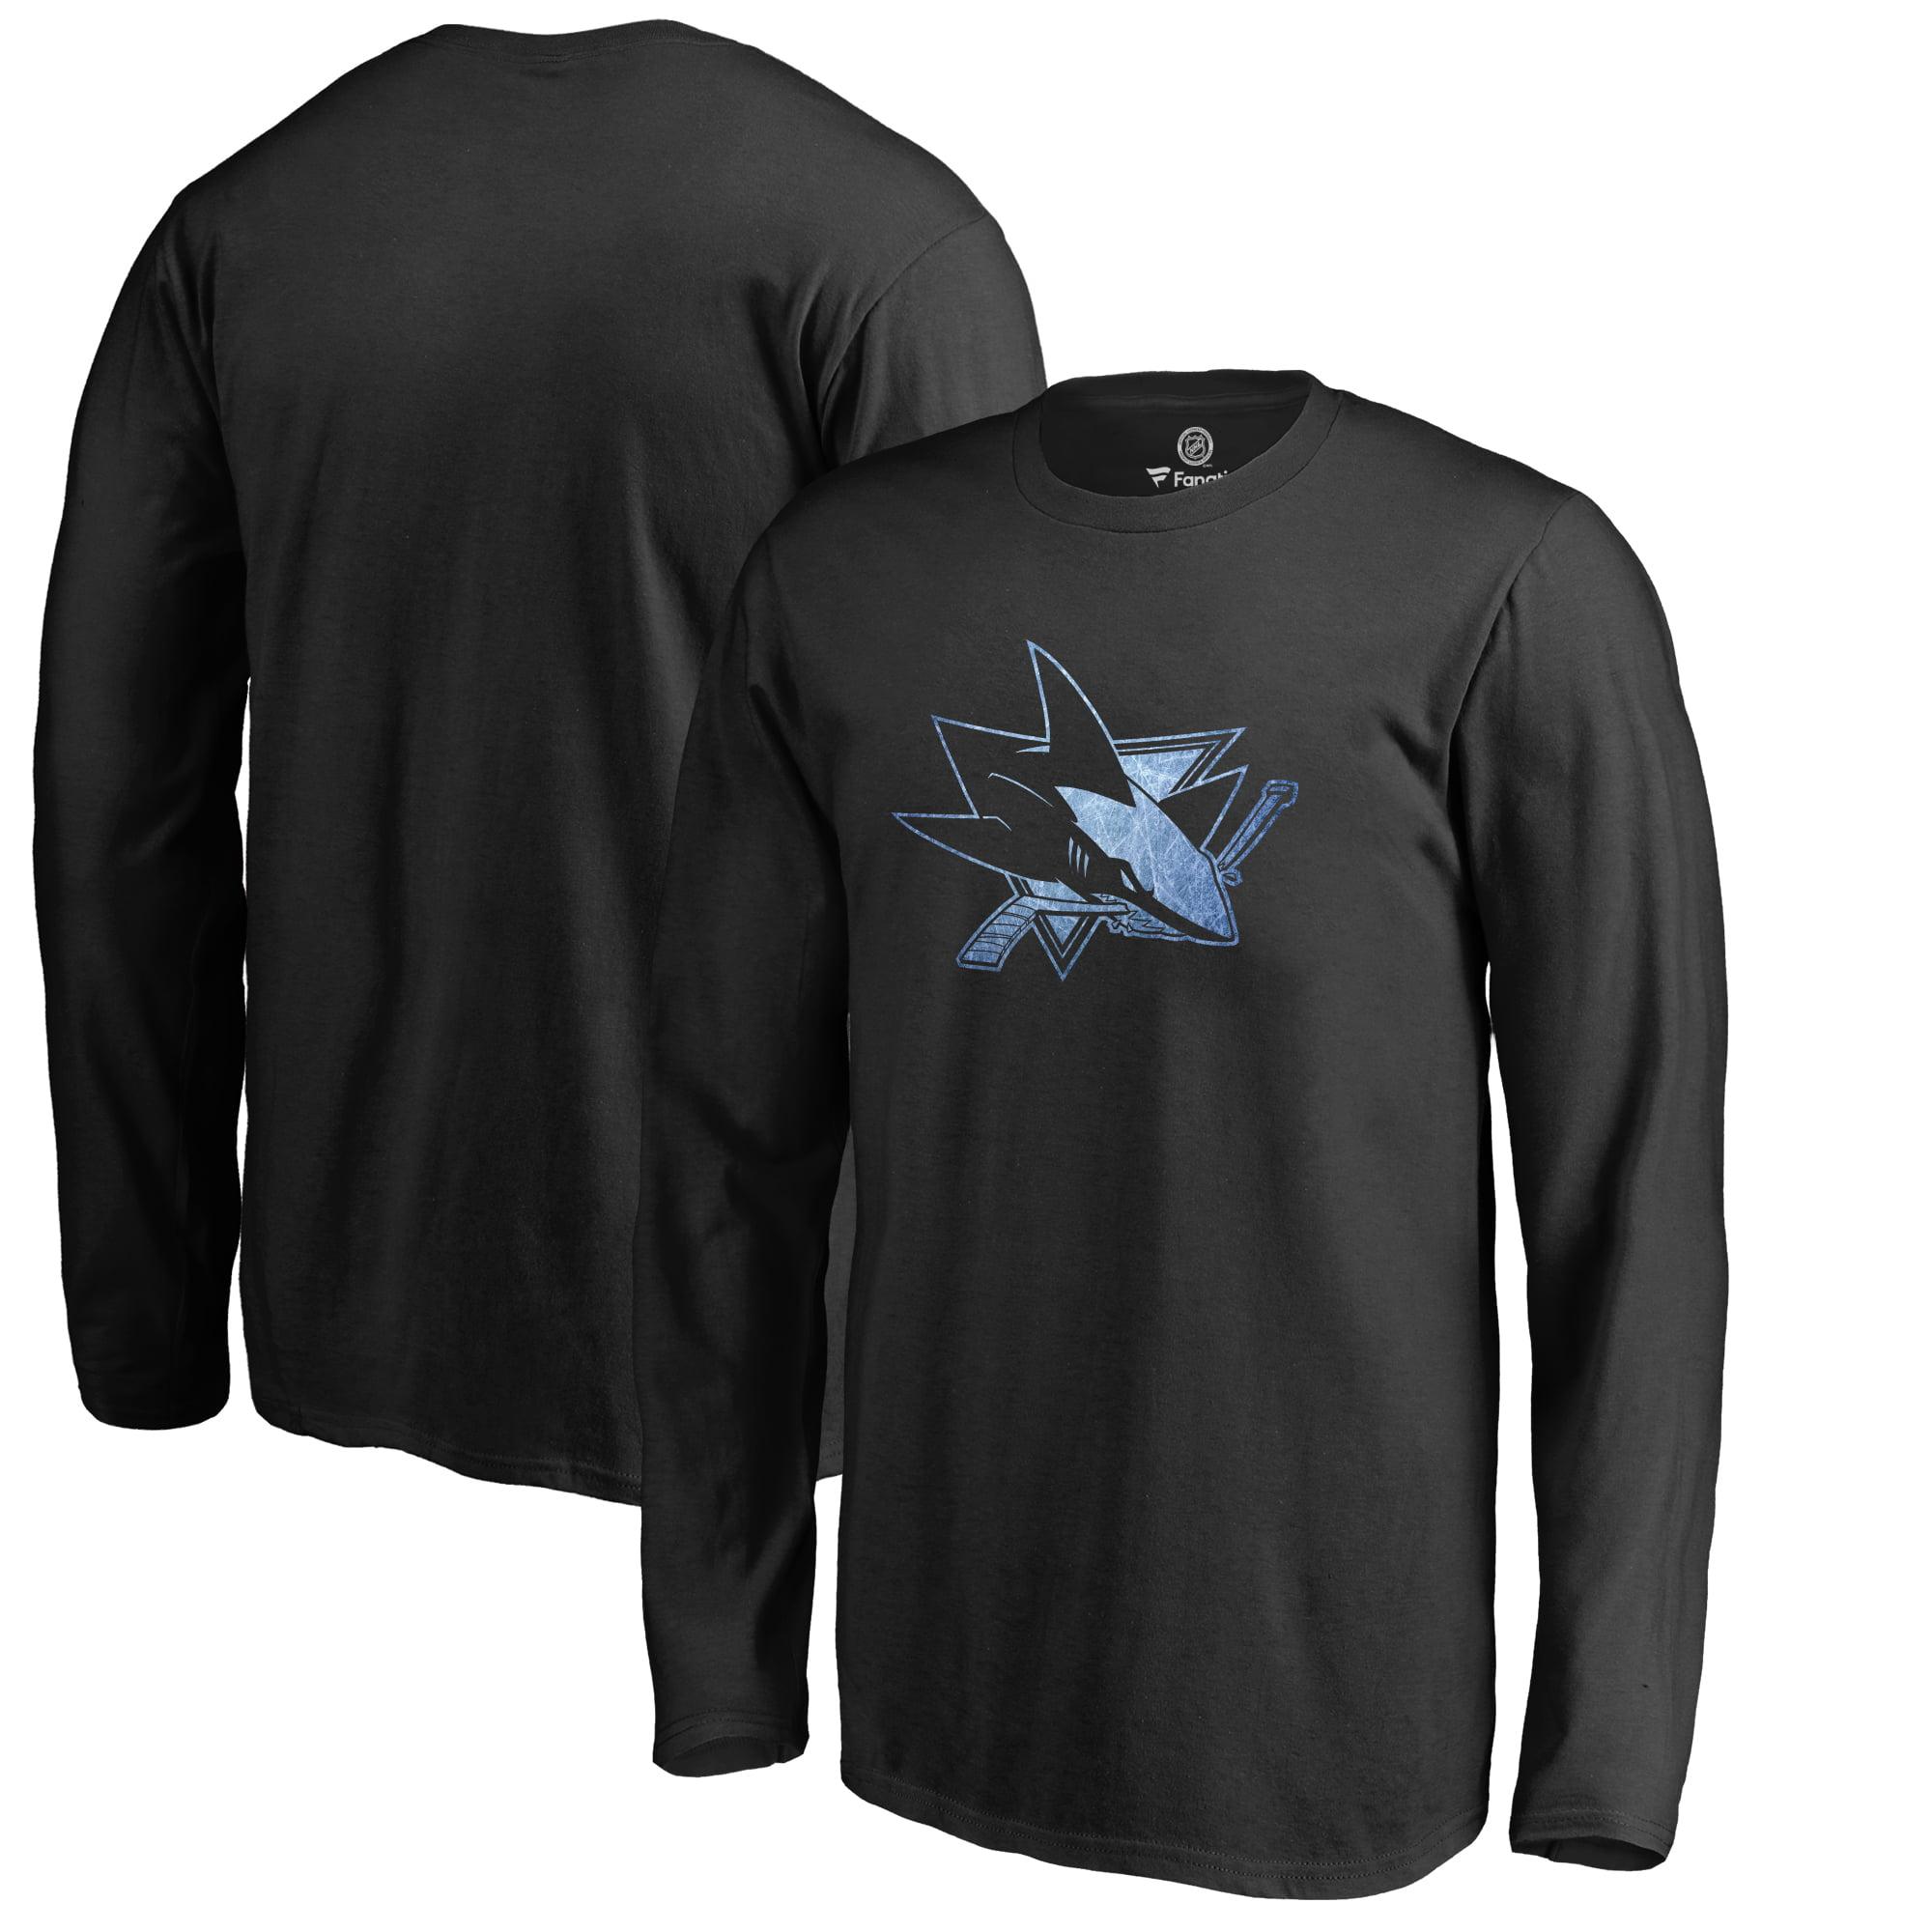 San Jose Sharks Youth Pond Hockey Long Sleeve T-Shirt Black by Football Fanatics/Ruppshirts